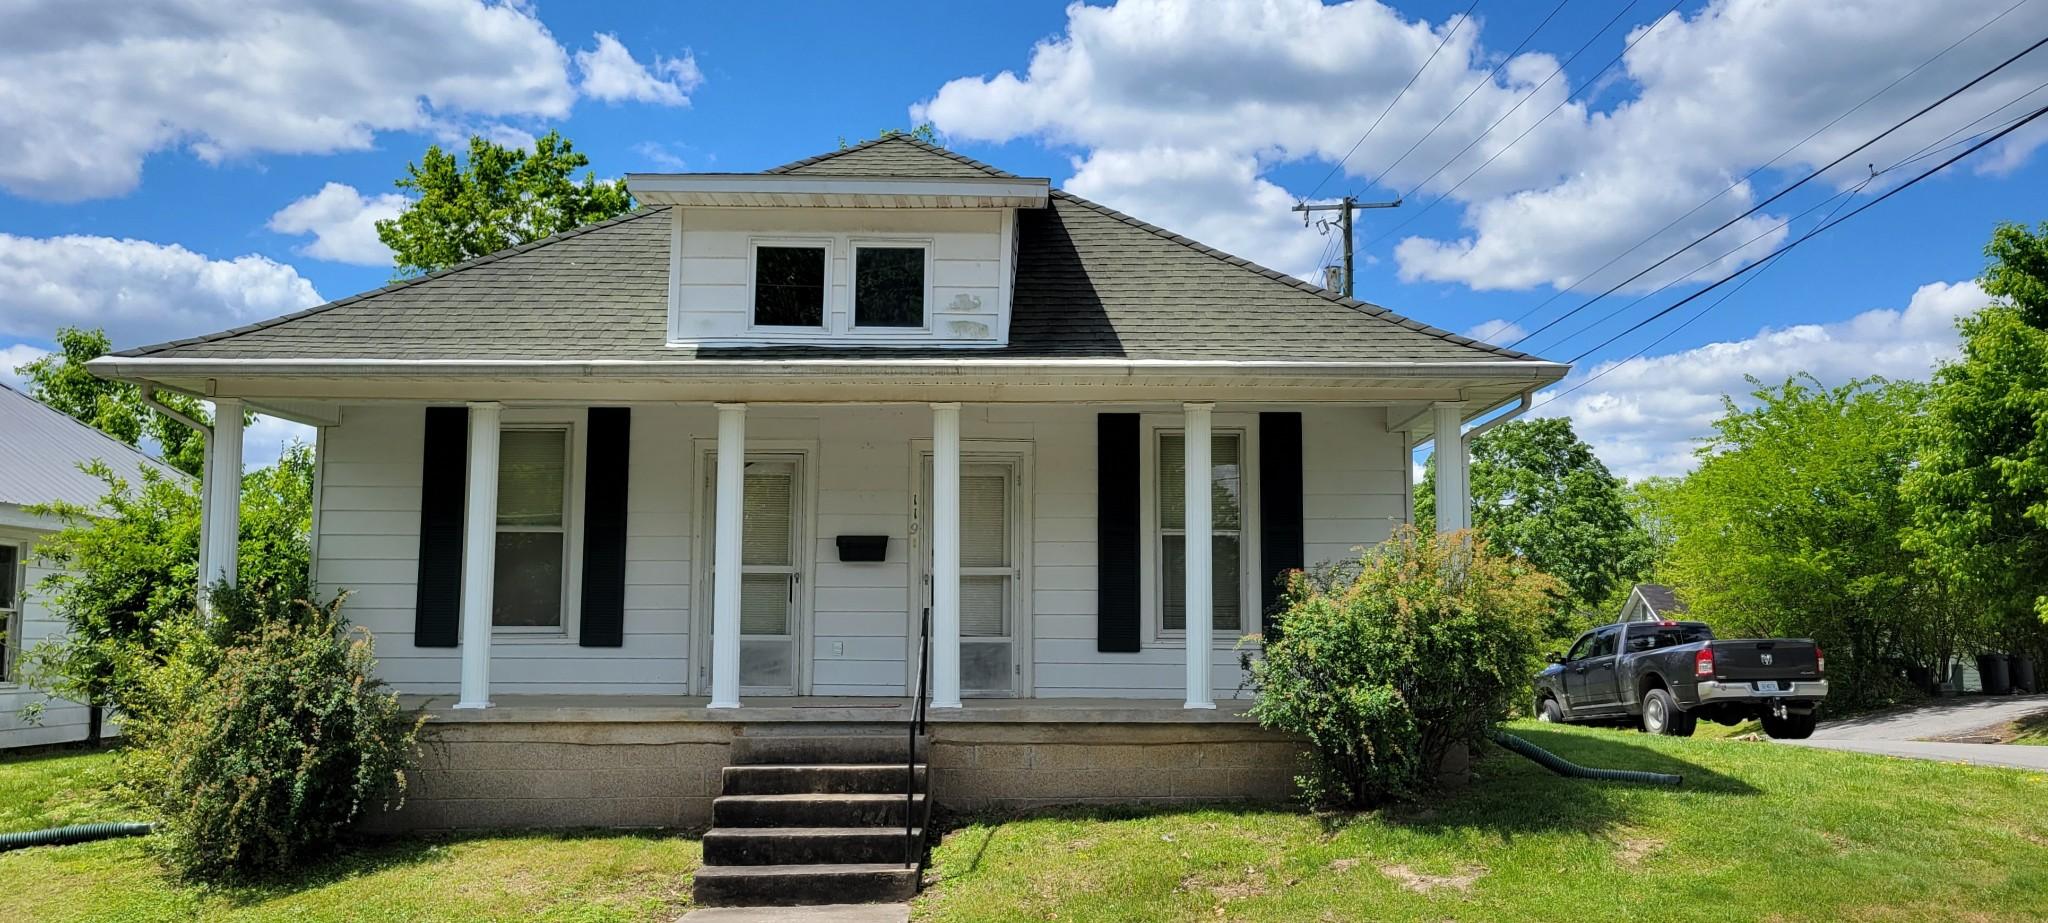 42408 Real Estate Listings Main Image